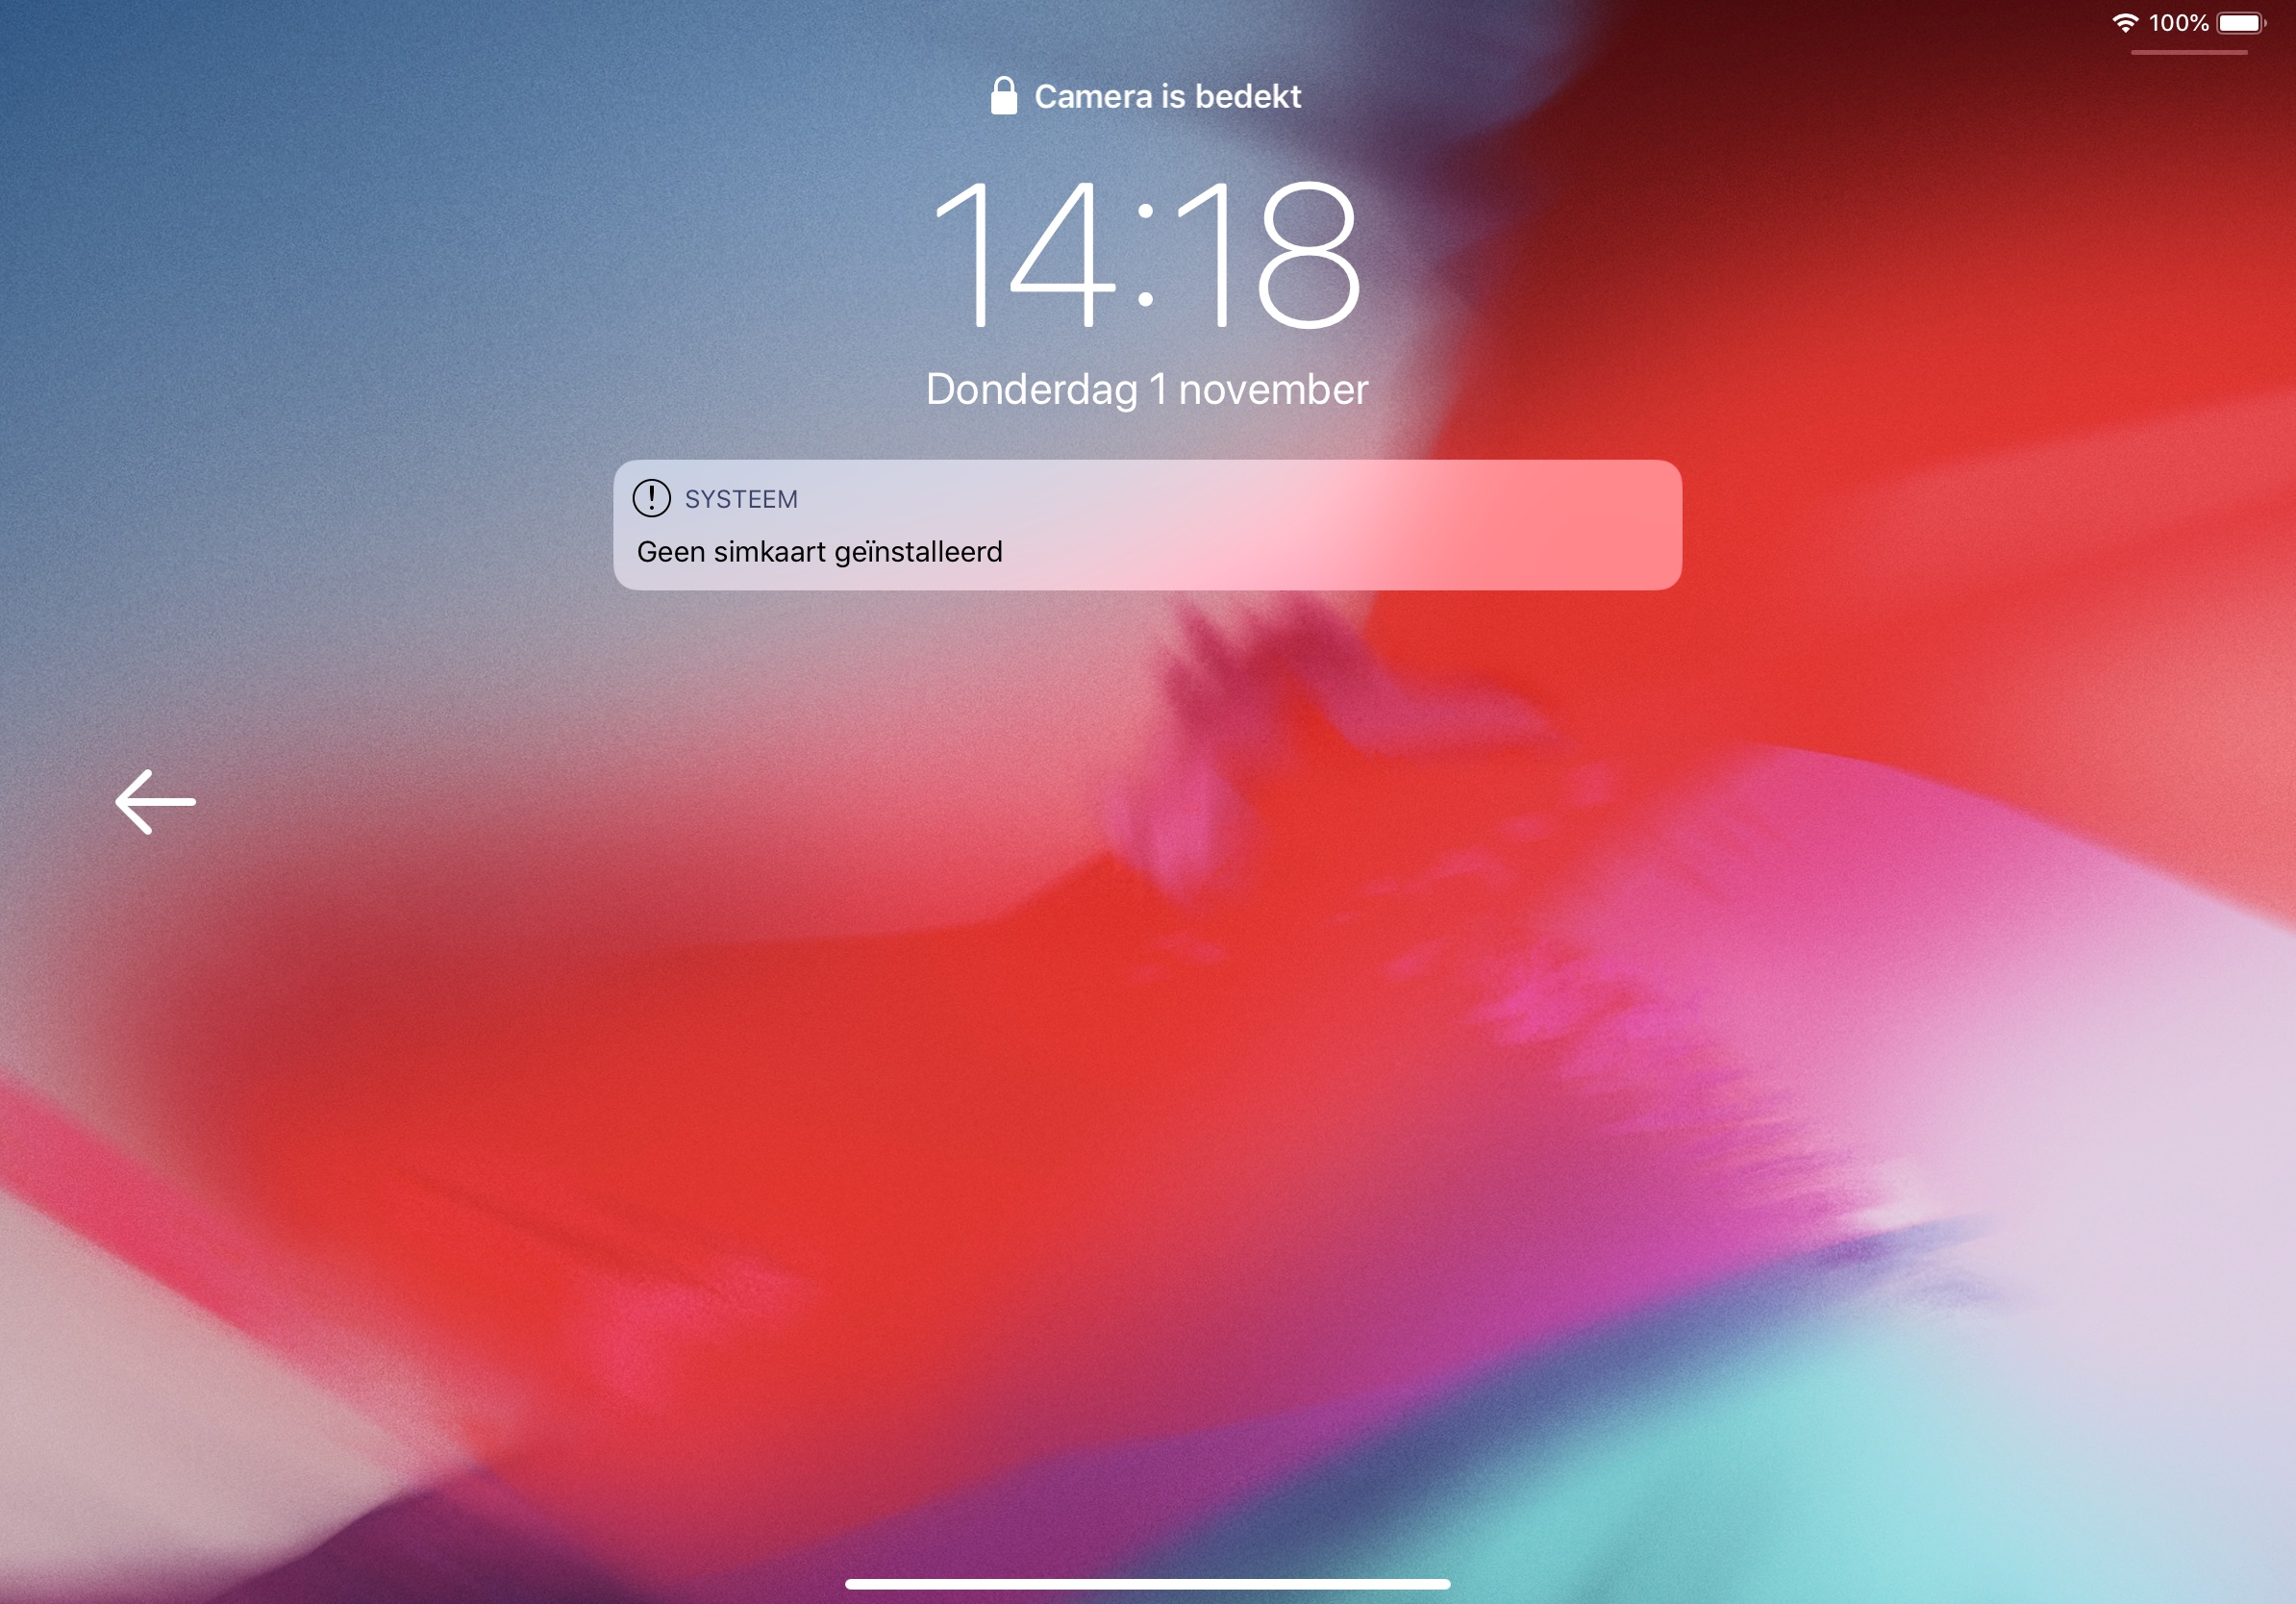 iPad Pro 2018 camera bedekt